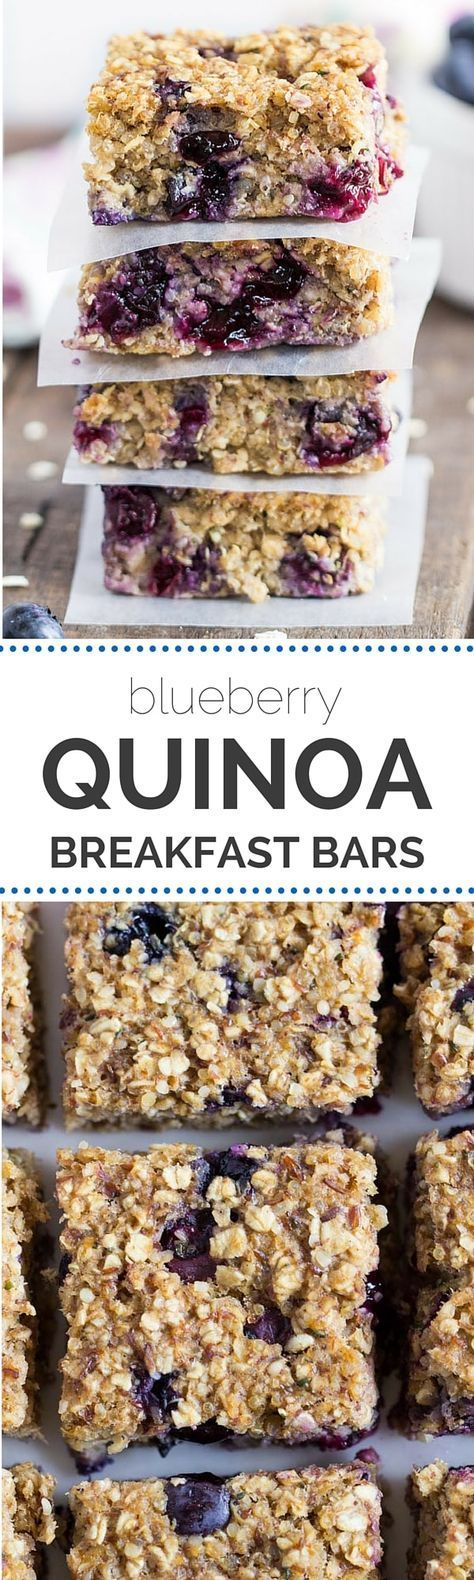 Blueberry Quinoa Breakfast Bars